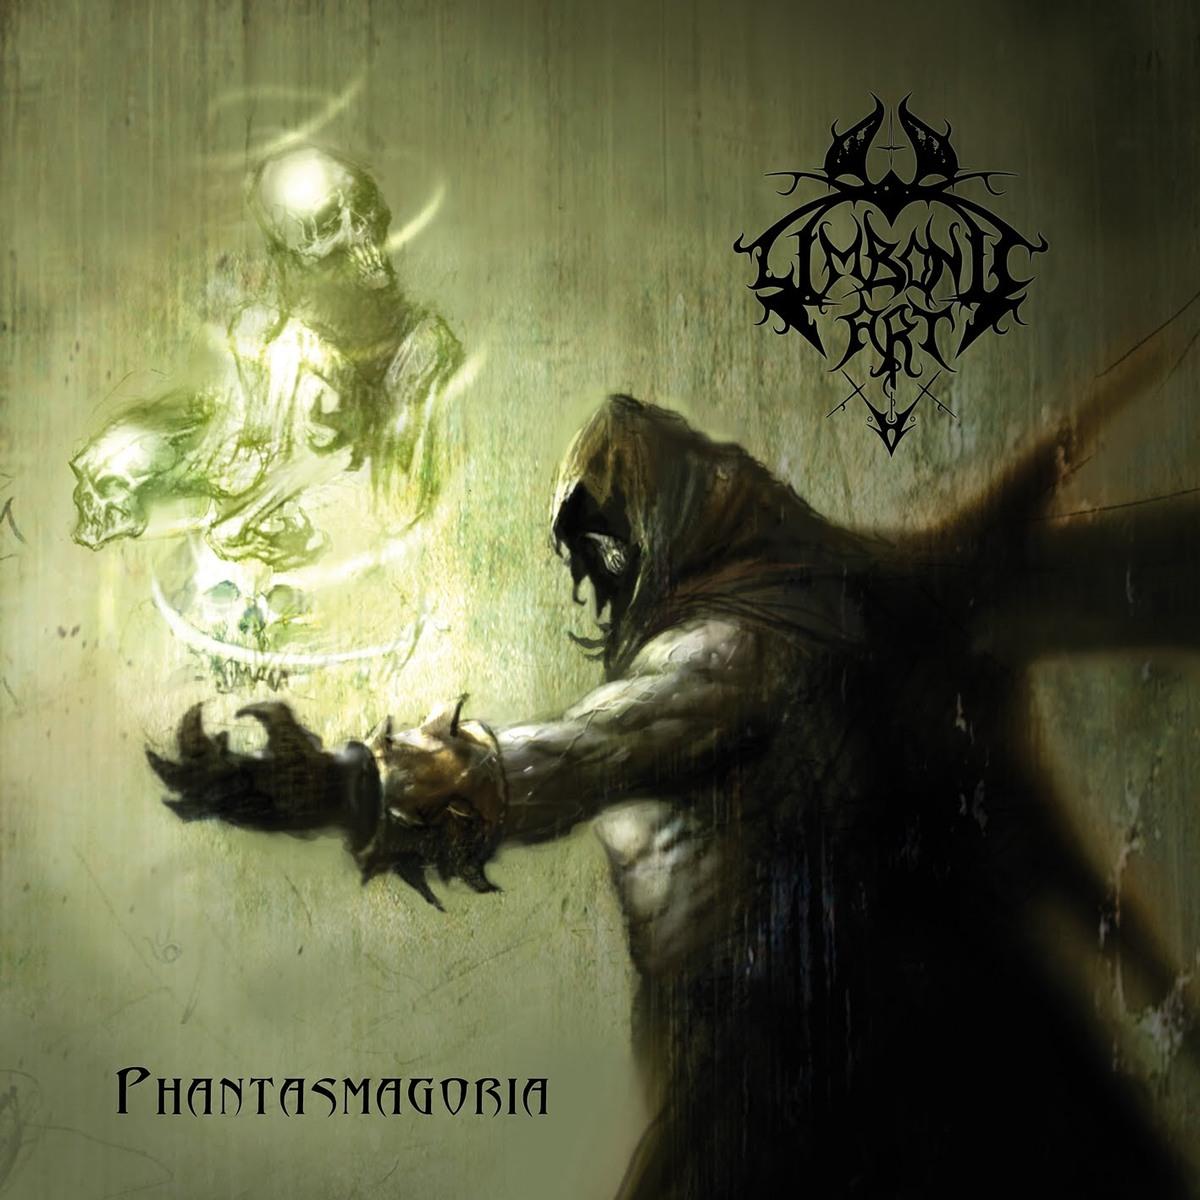 "Limbonic Art prestes a soltar álbum intitulado ""Phantasmagoria"" dia 19 de Julho de 2010 271817"